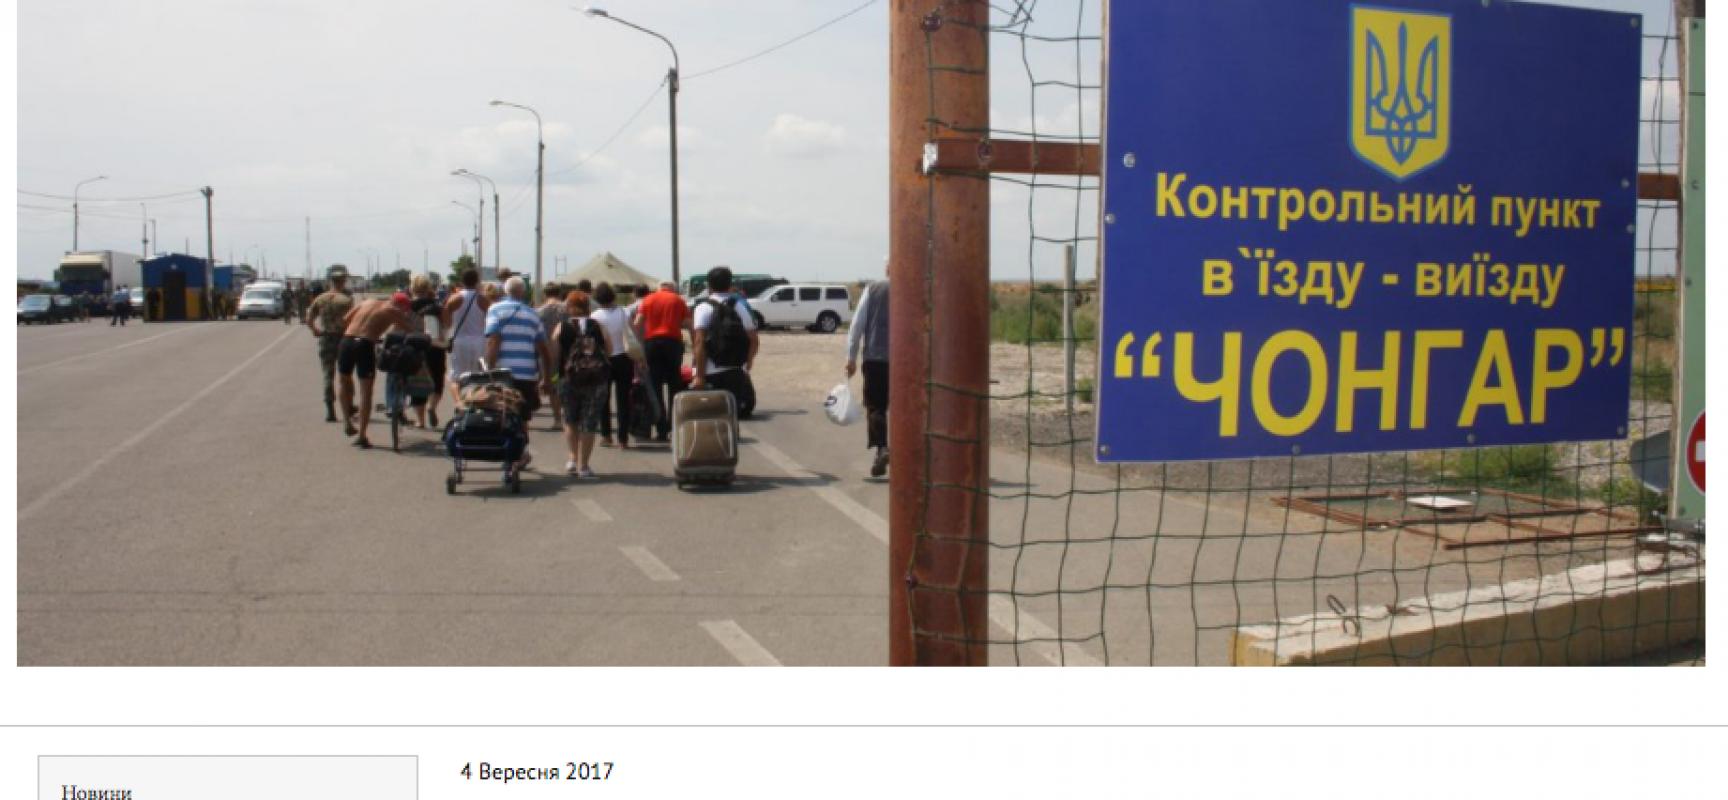 Fake : folla di ucraini in Crimea per le vacanze